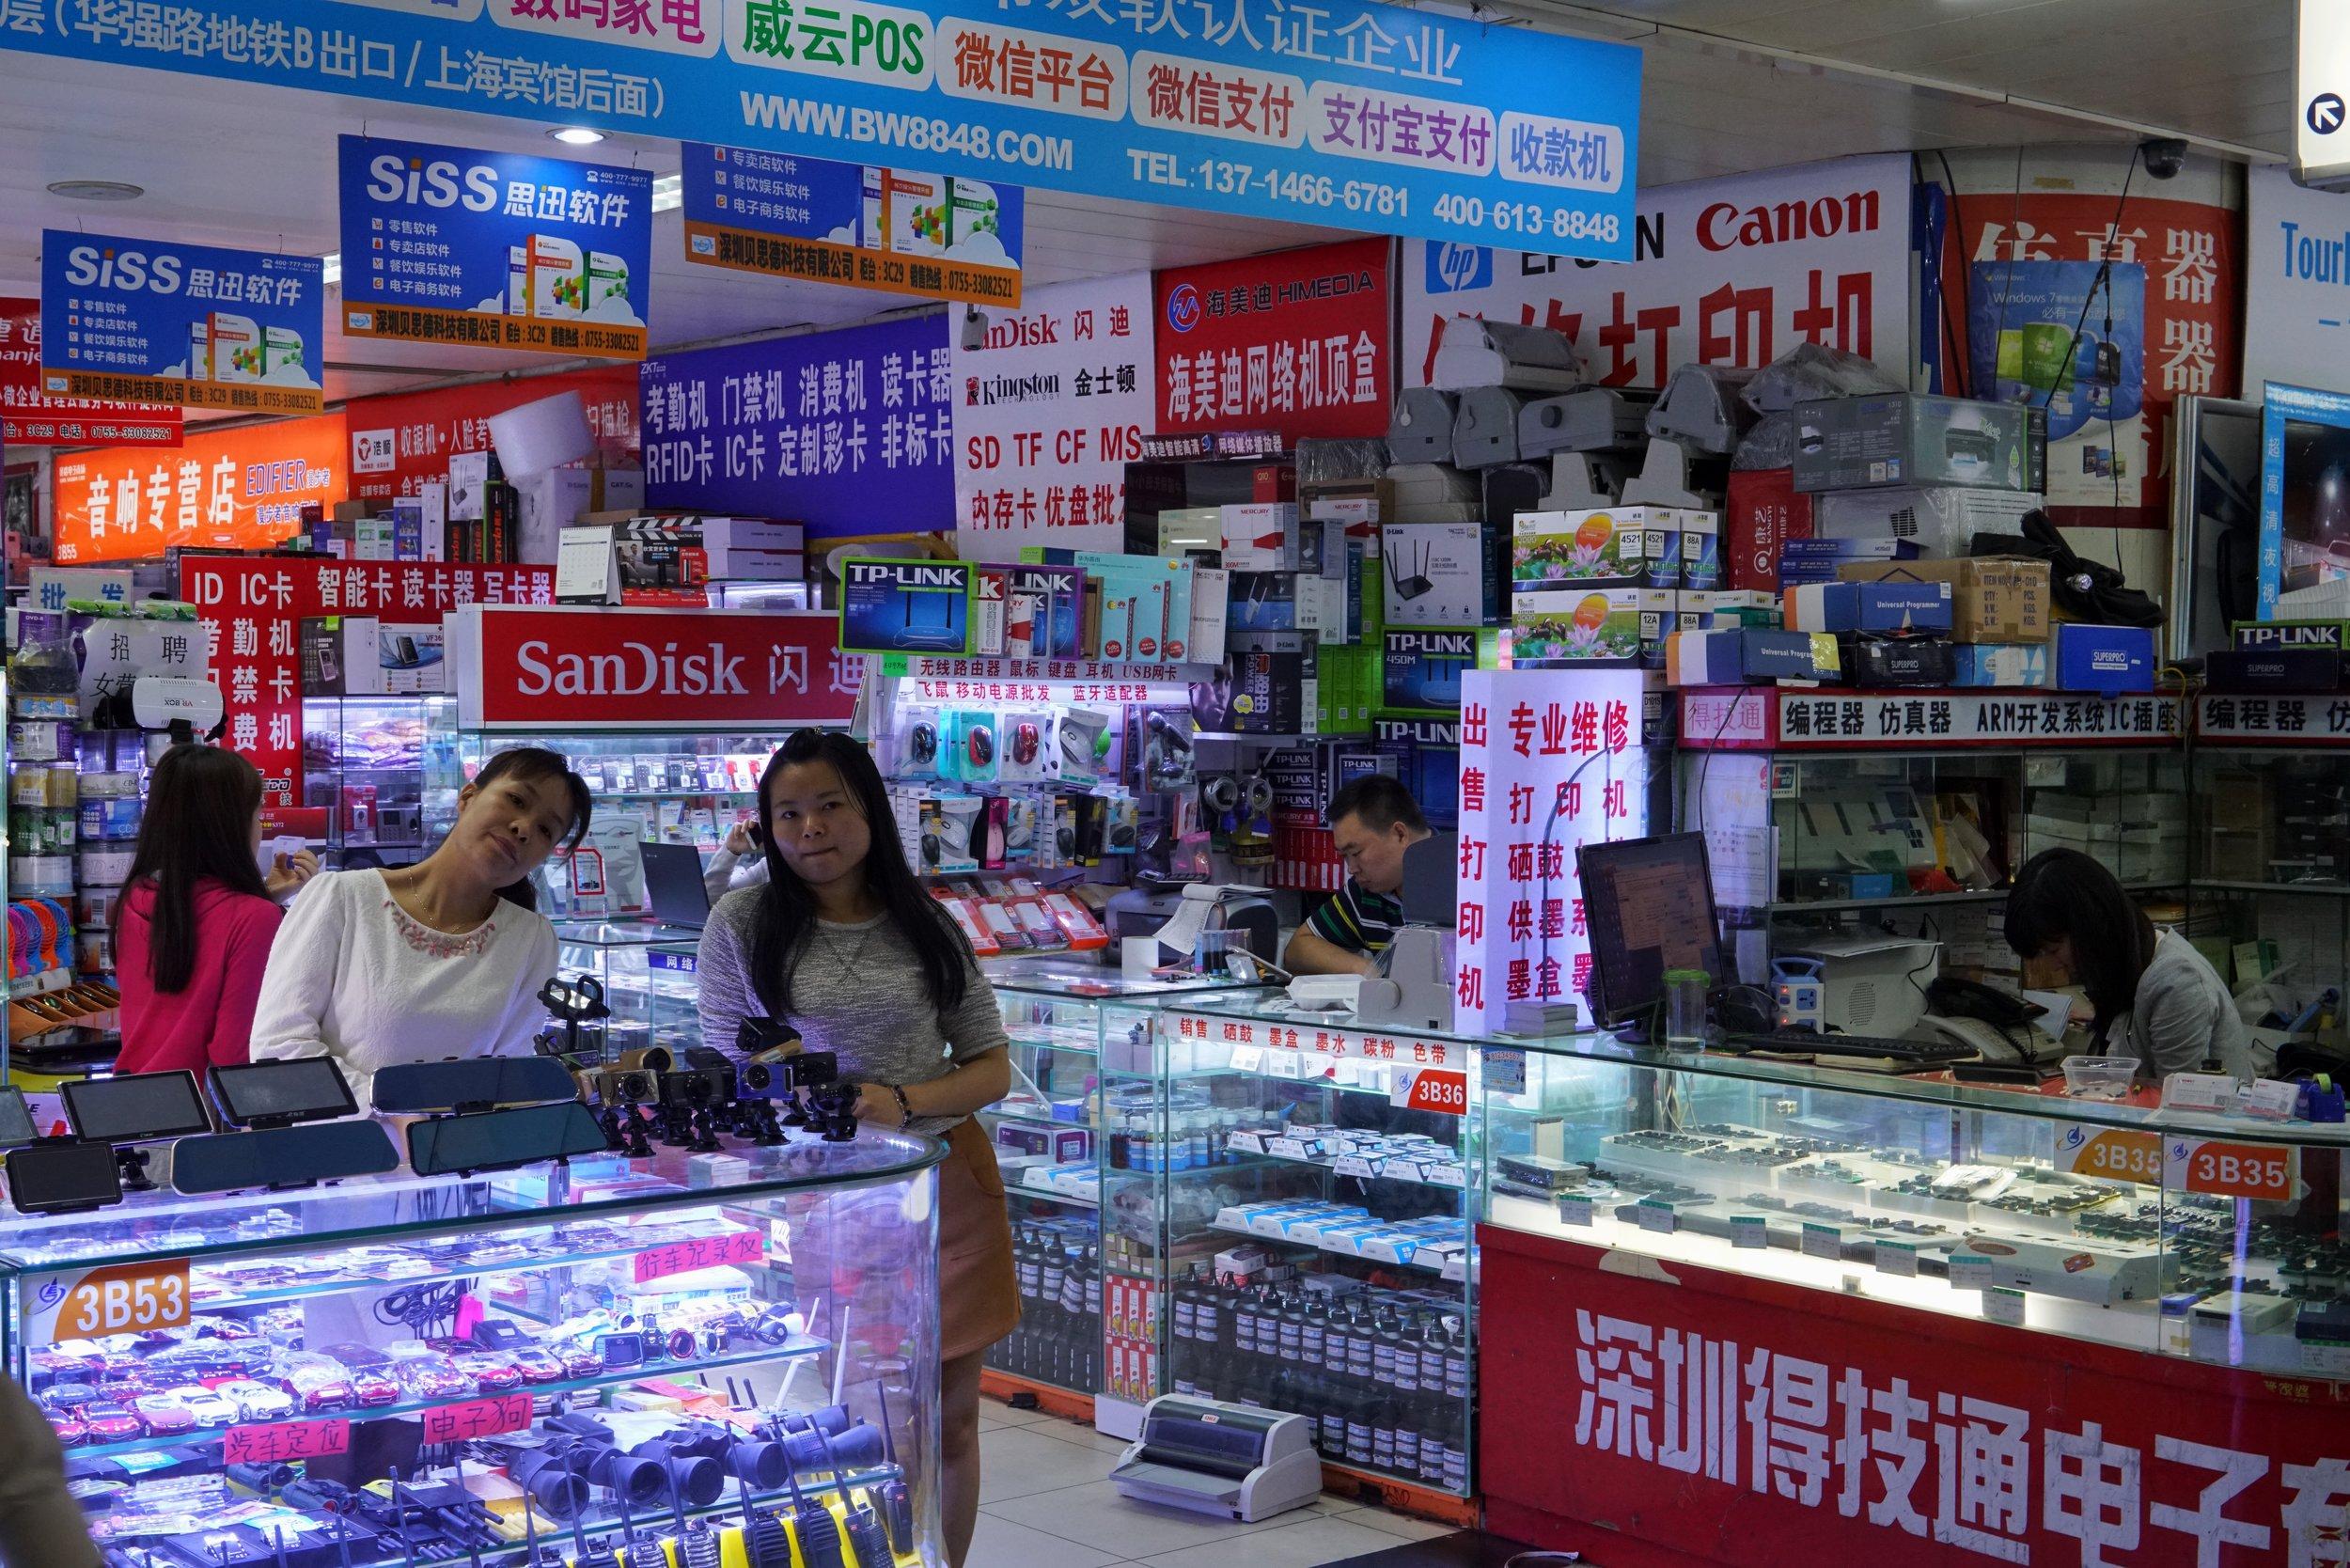 19-Shenzhen-vendors.jpg